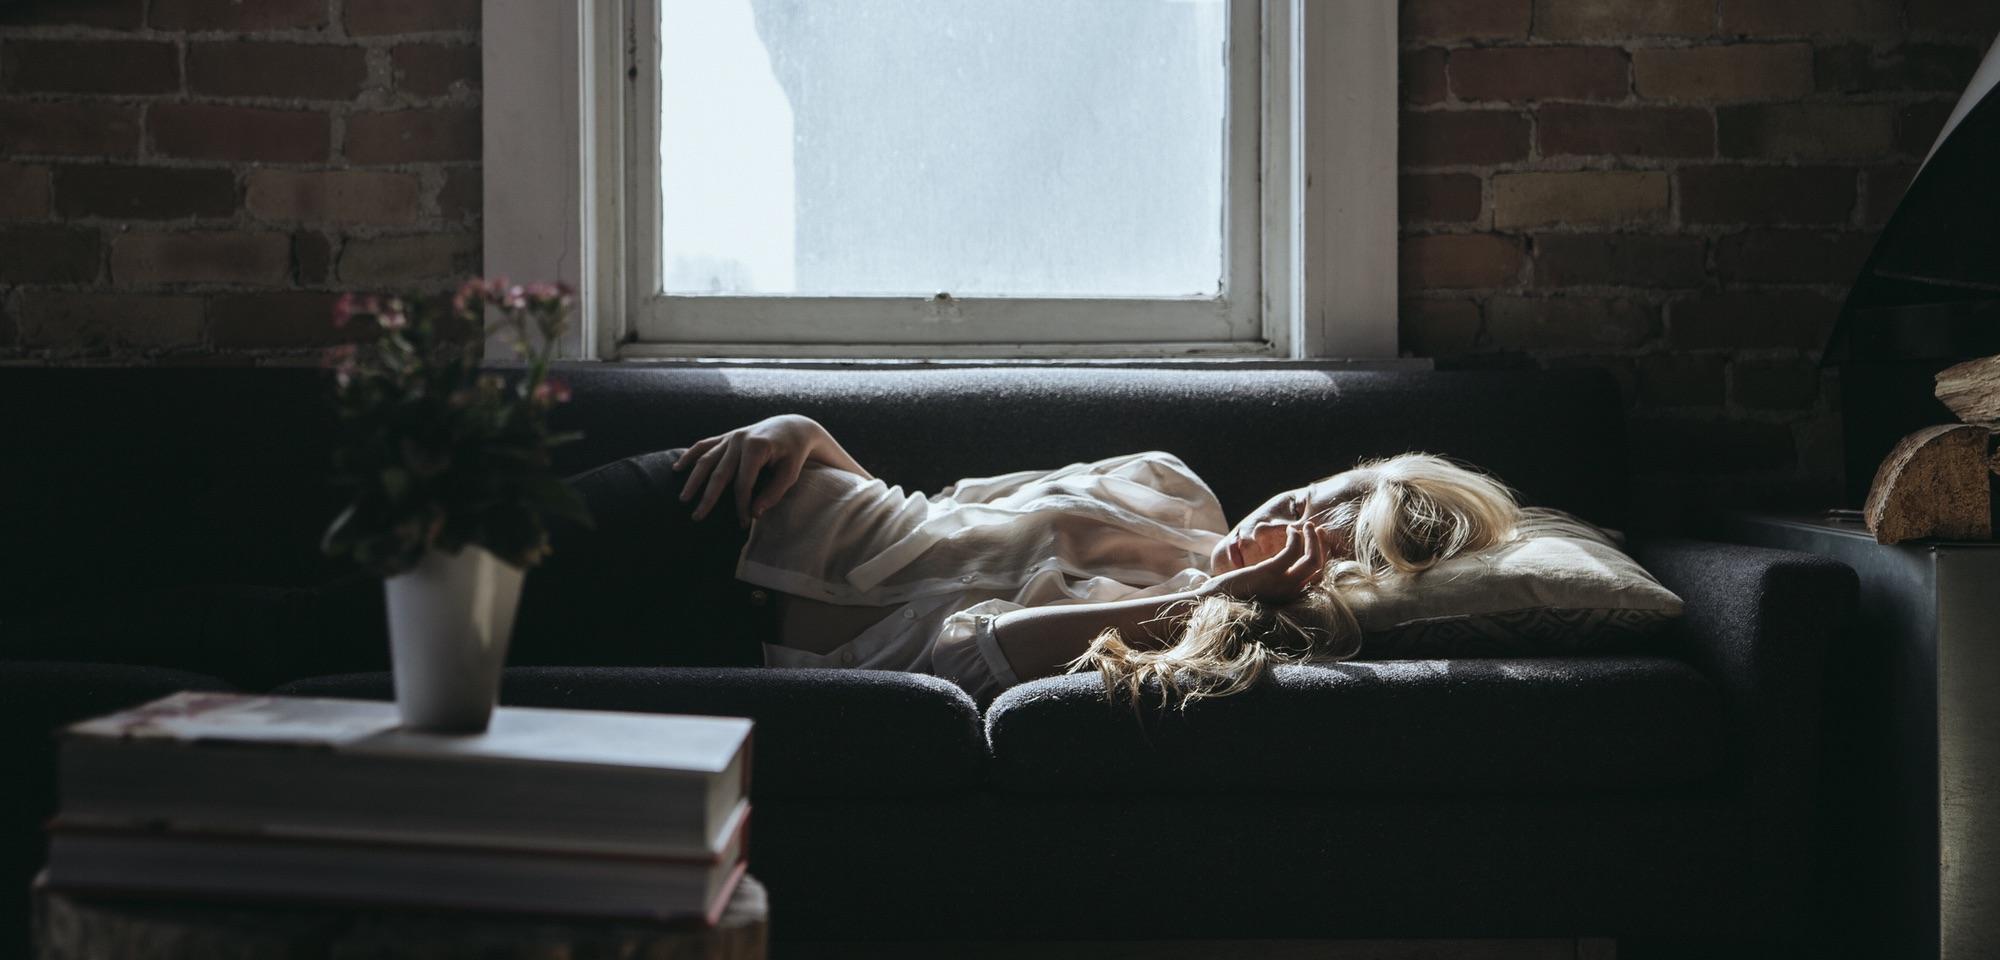 New parents sleep deprivation